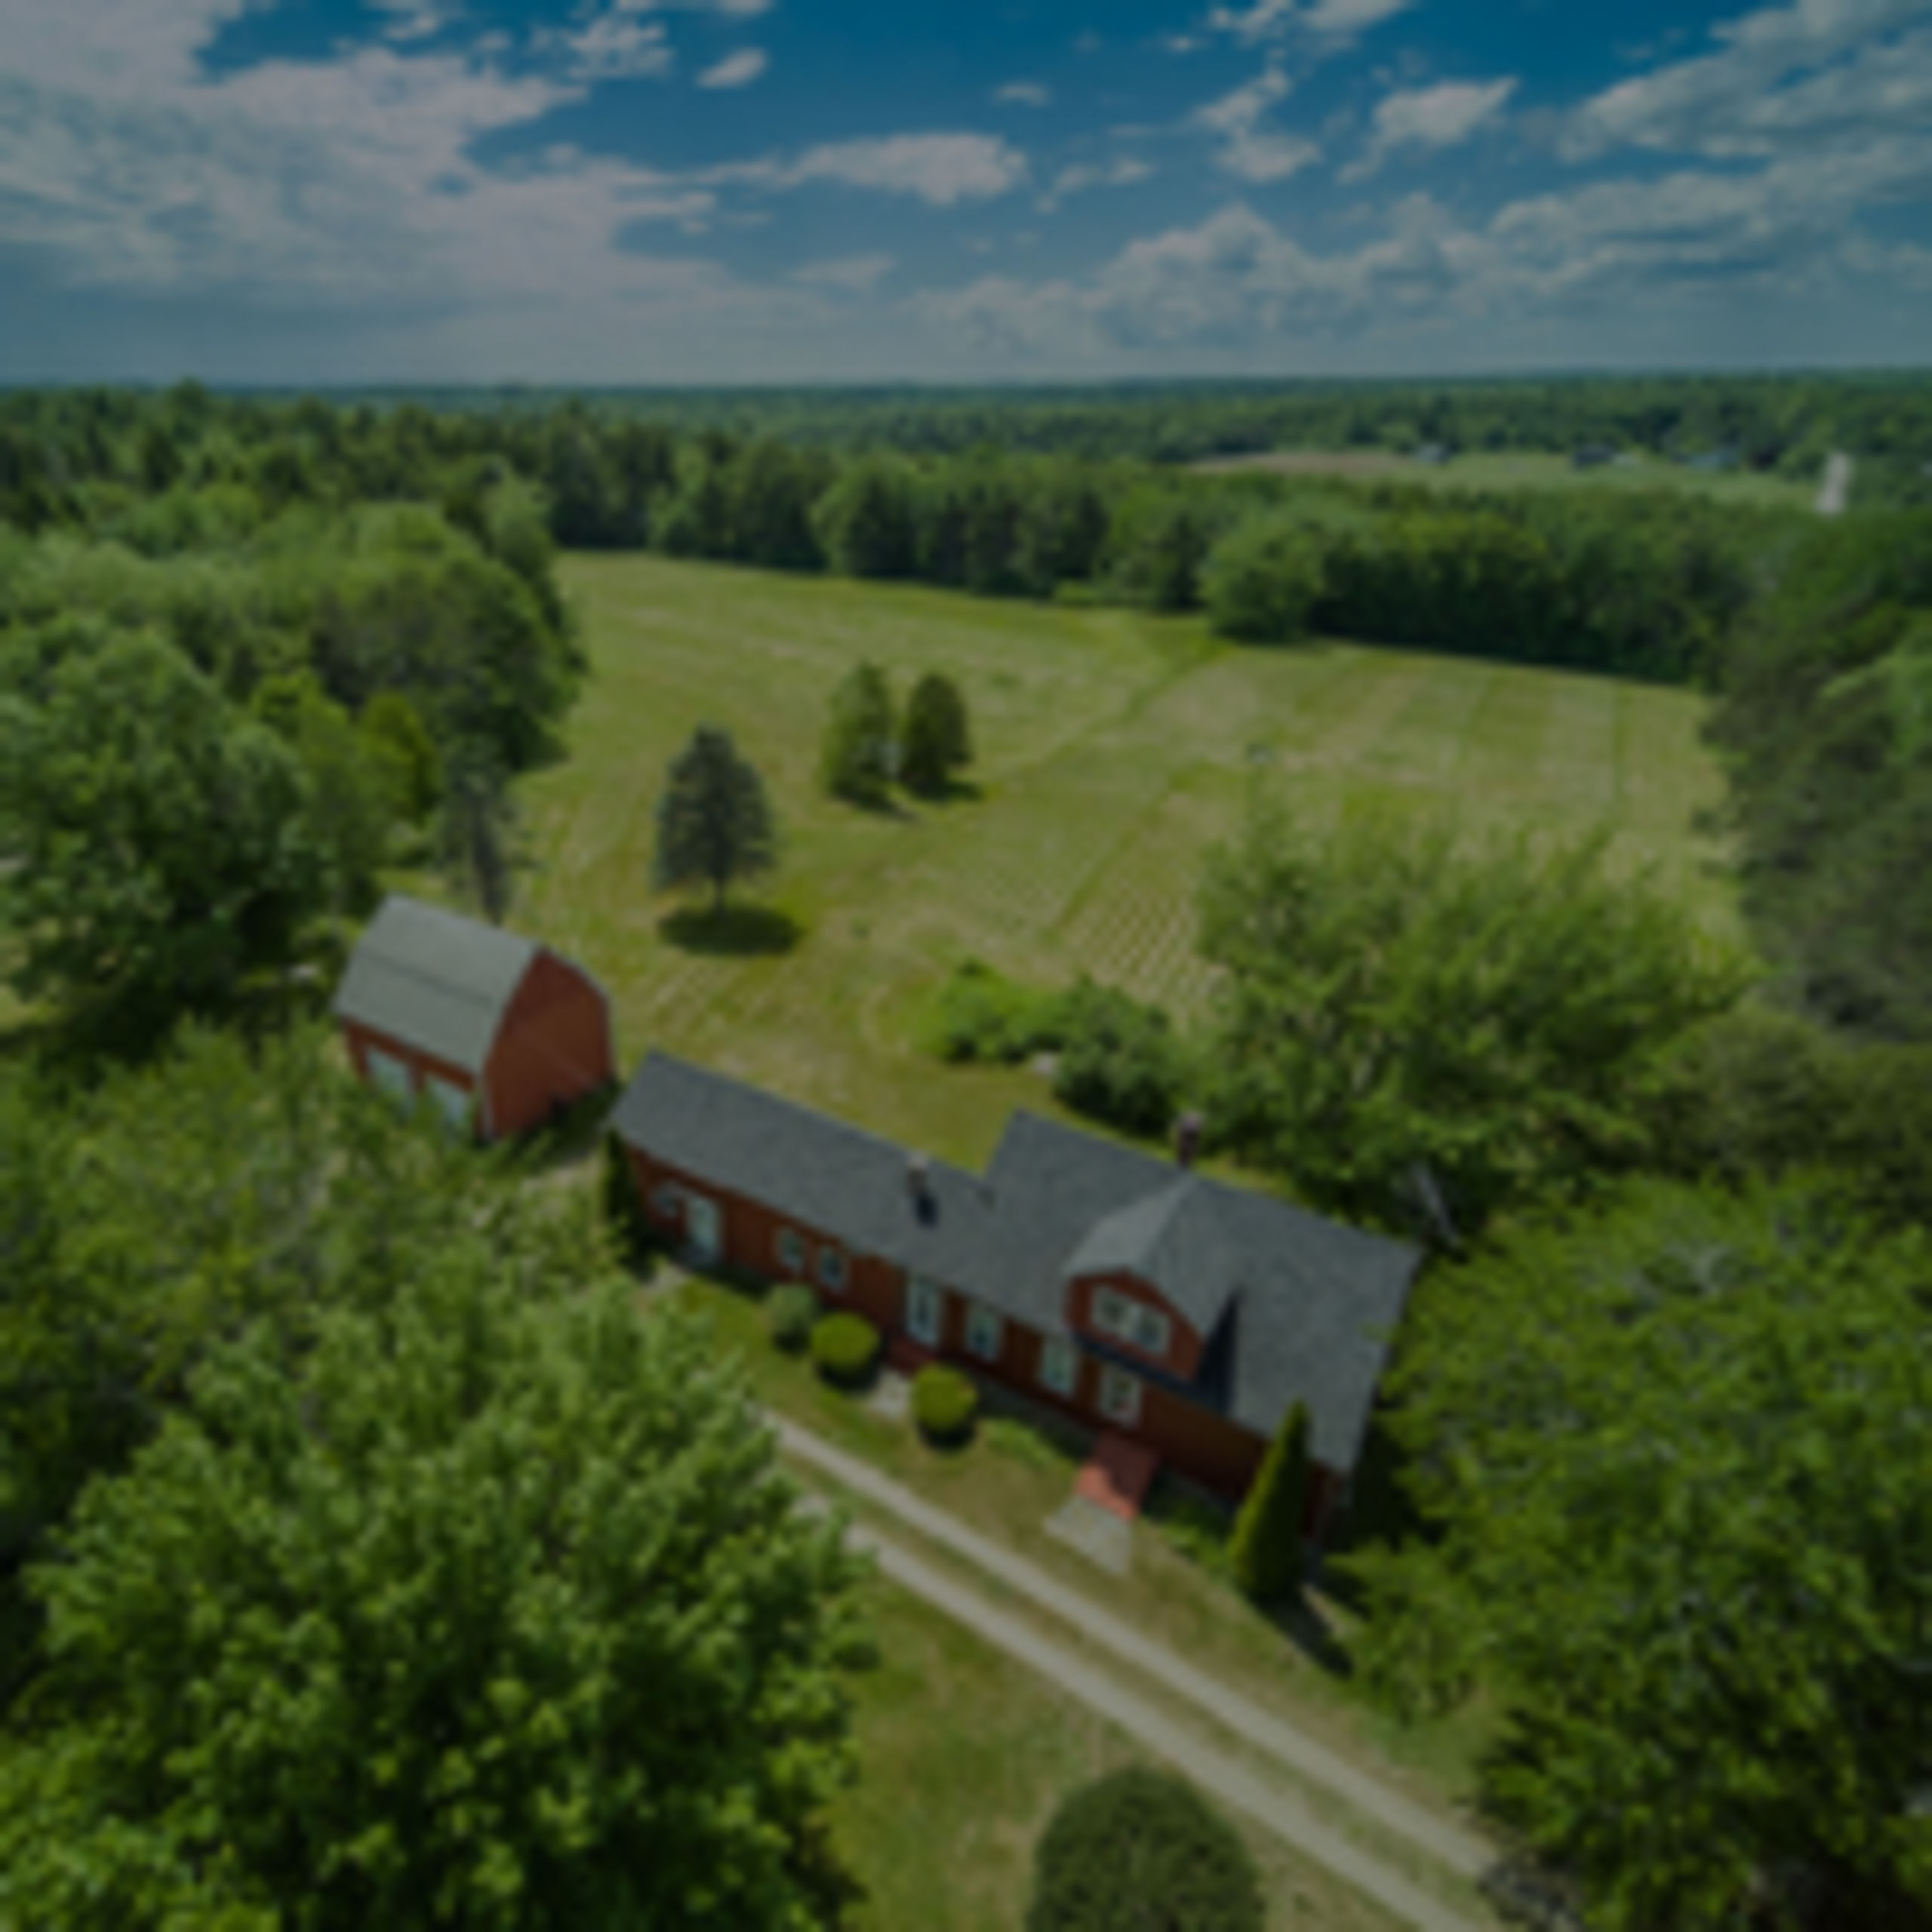 76 Cross Road, Cushing: 1815 Farmhouse on 58 Acres